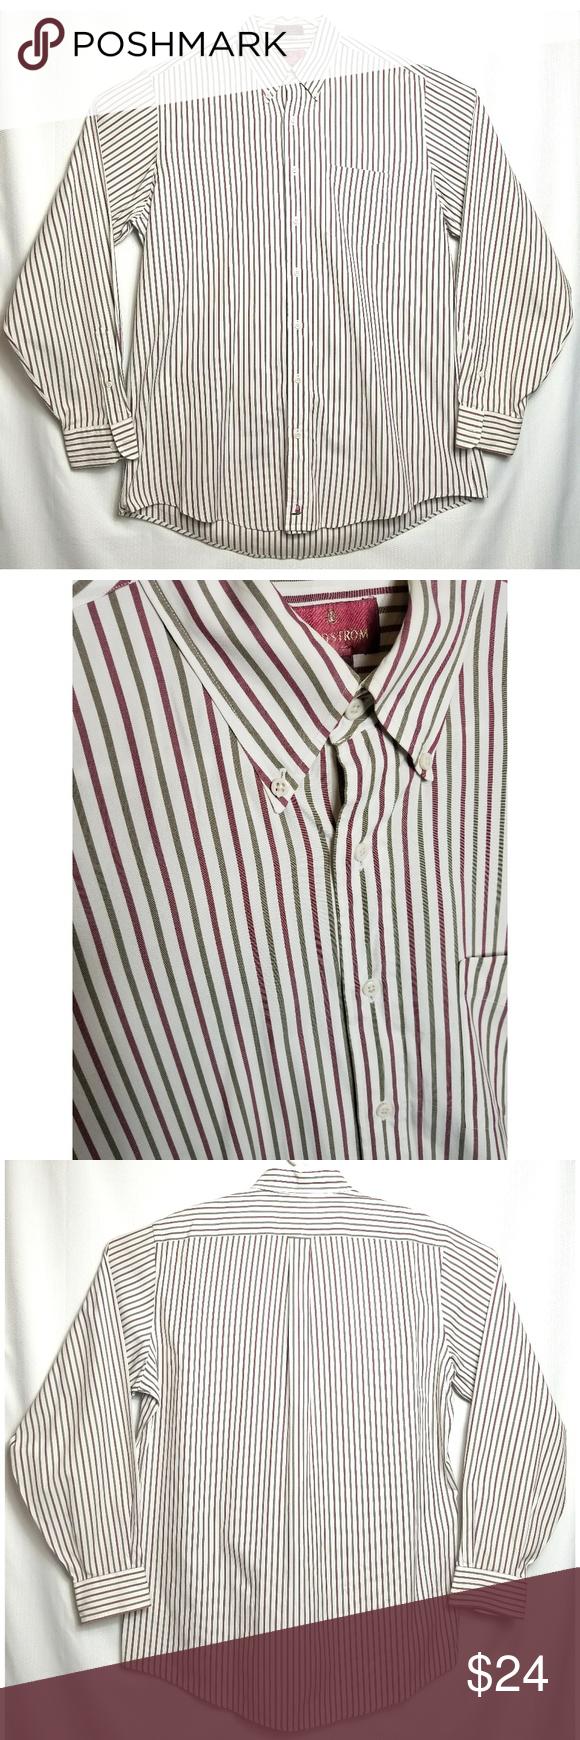 Nordstrom Men S Striped Dress Shirt 16 1 2 36 Nordstrom Shirt Dress Red Shirt Dress Striped Dress [ 1740 x 580 Pixel ]